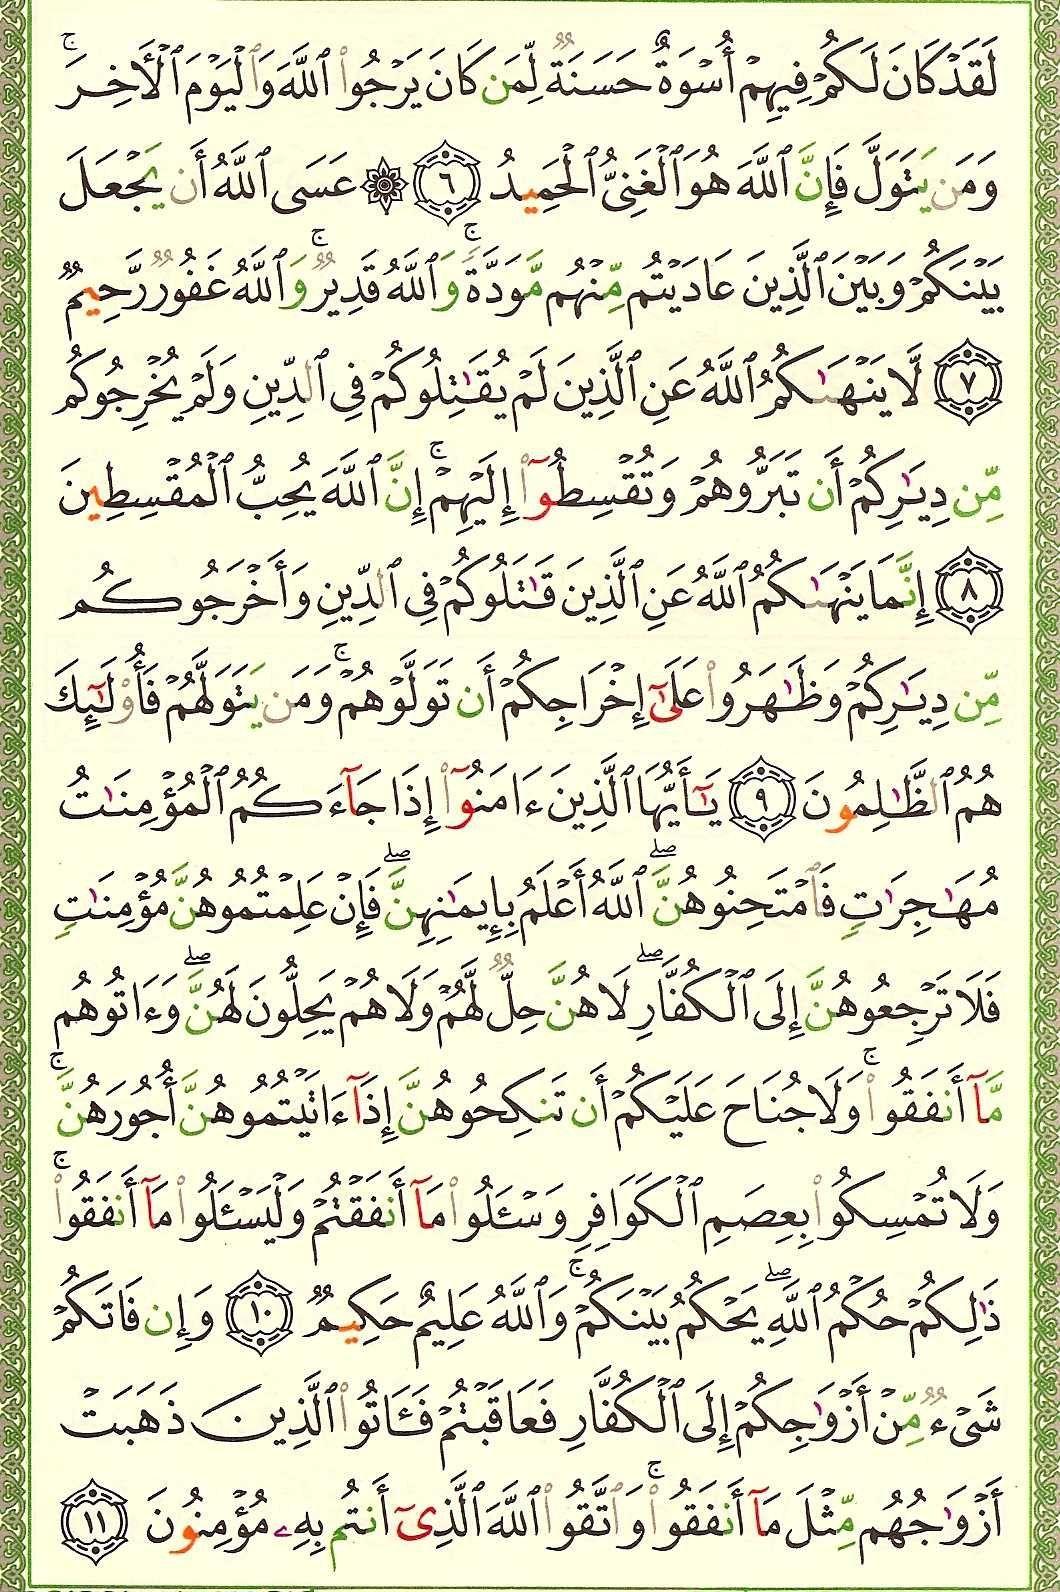 Quran 60 Al Mumtahana سورة الممتحنة Style 1 Page 550 القرآن الكريم